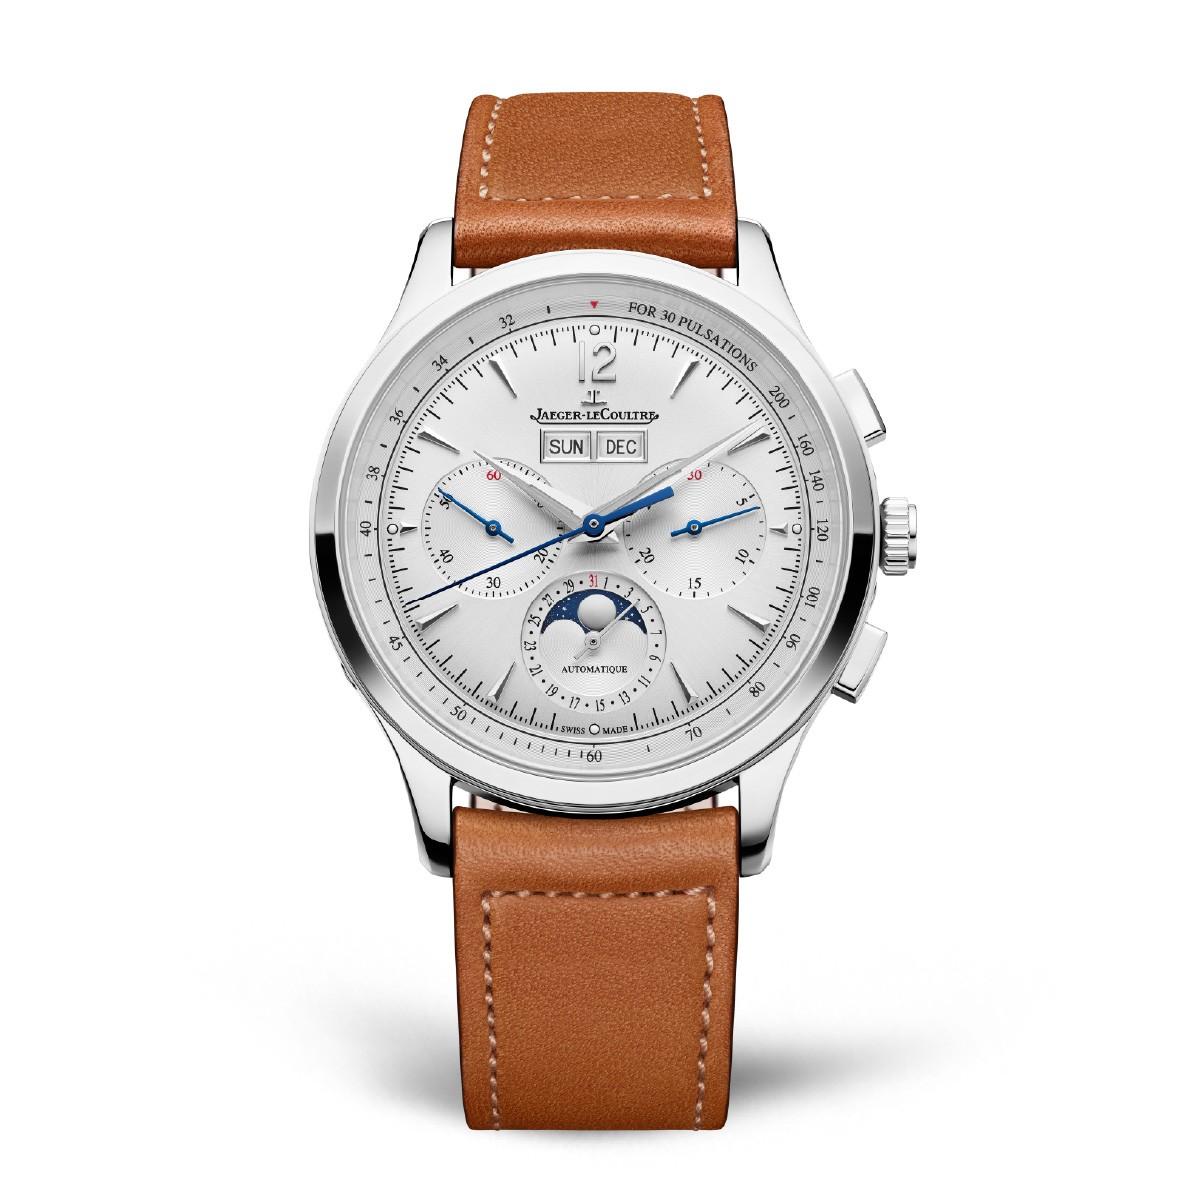 Produkt jlc master control chronograph calendar q front